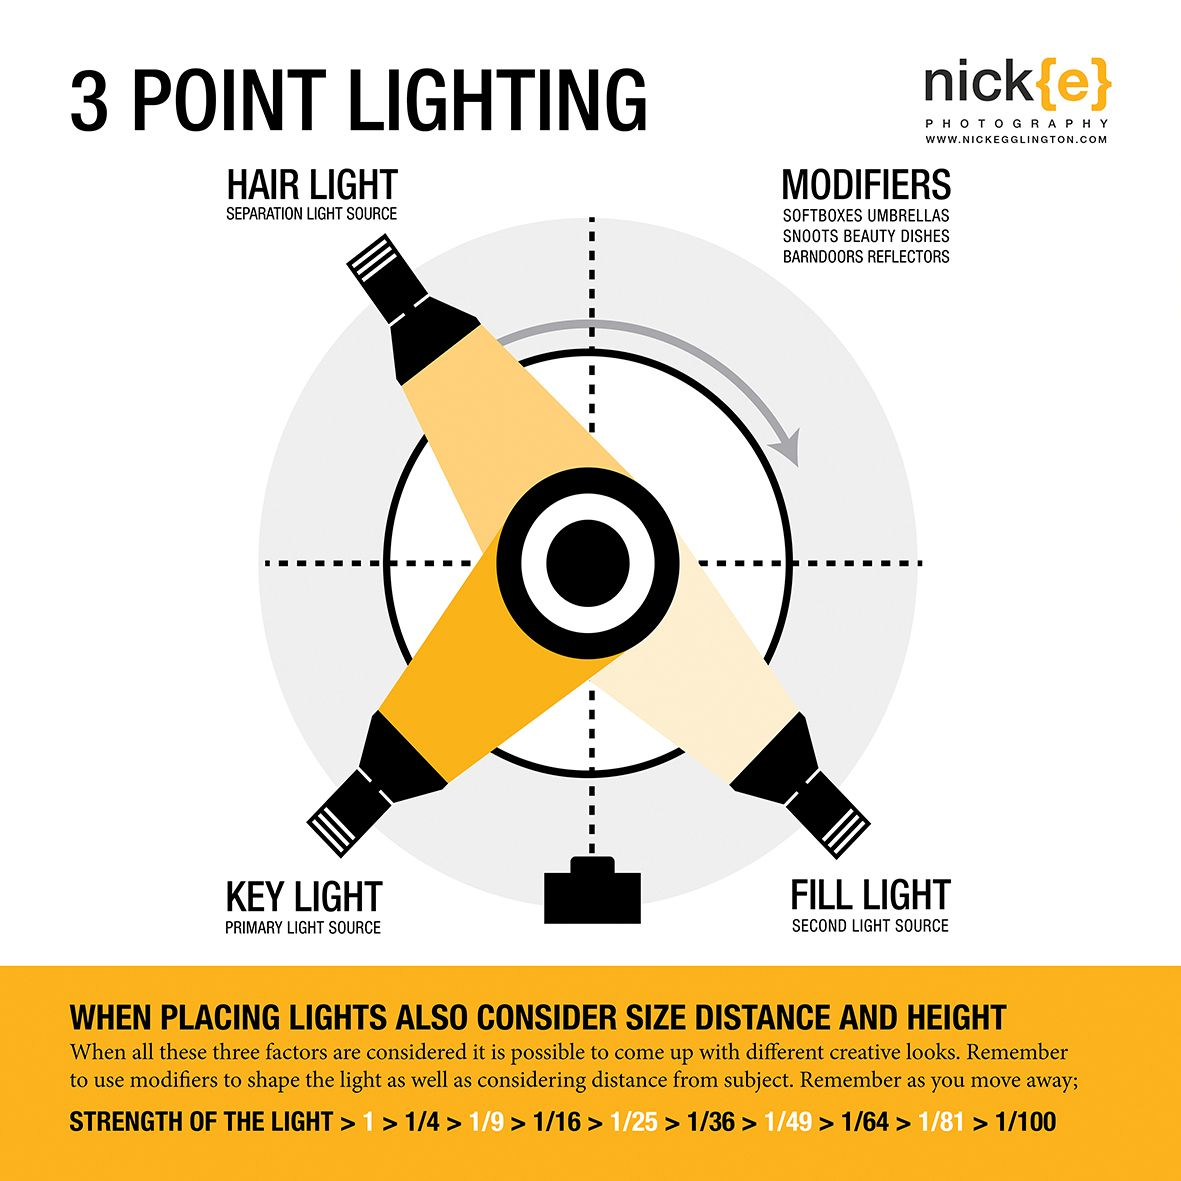 Photography Tutorials Tumblr Photography Lighting Techniques 3 Point Lighting Three Point Lighting